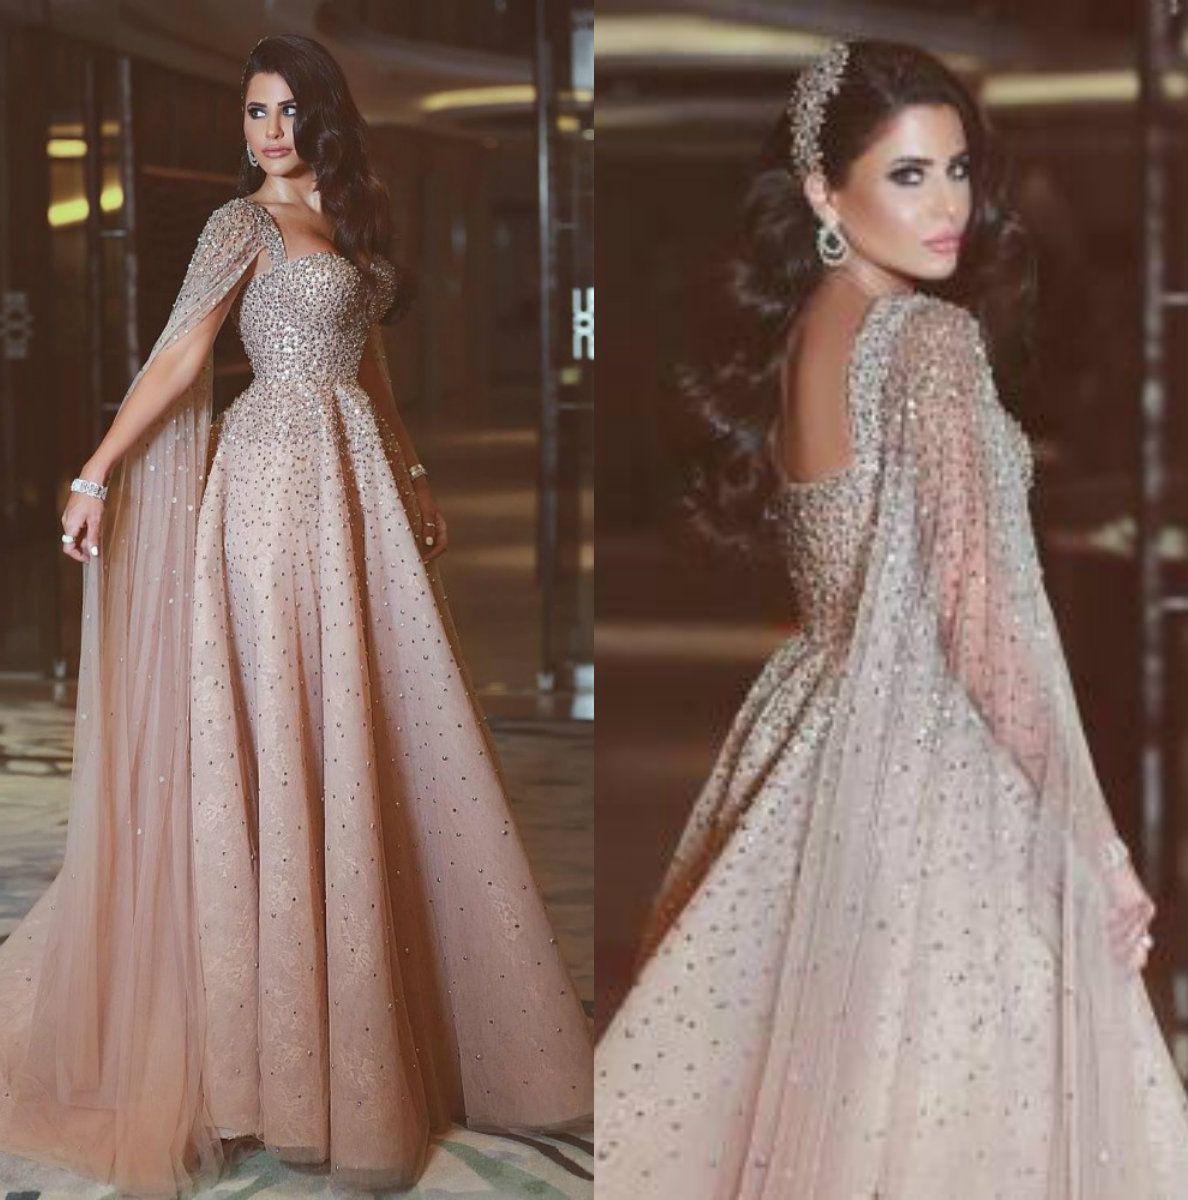 Elegant Dresses Evening Wear Rhinestone Champagne Formal Dress With ...